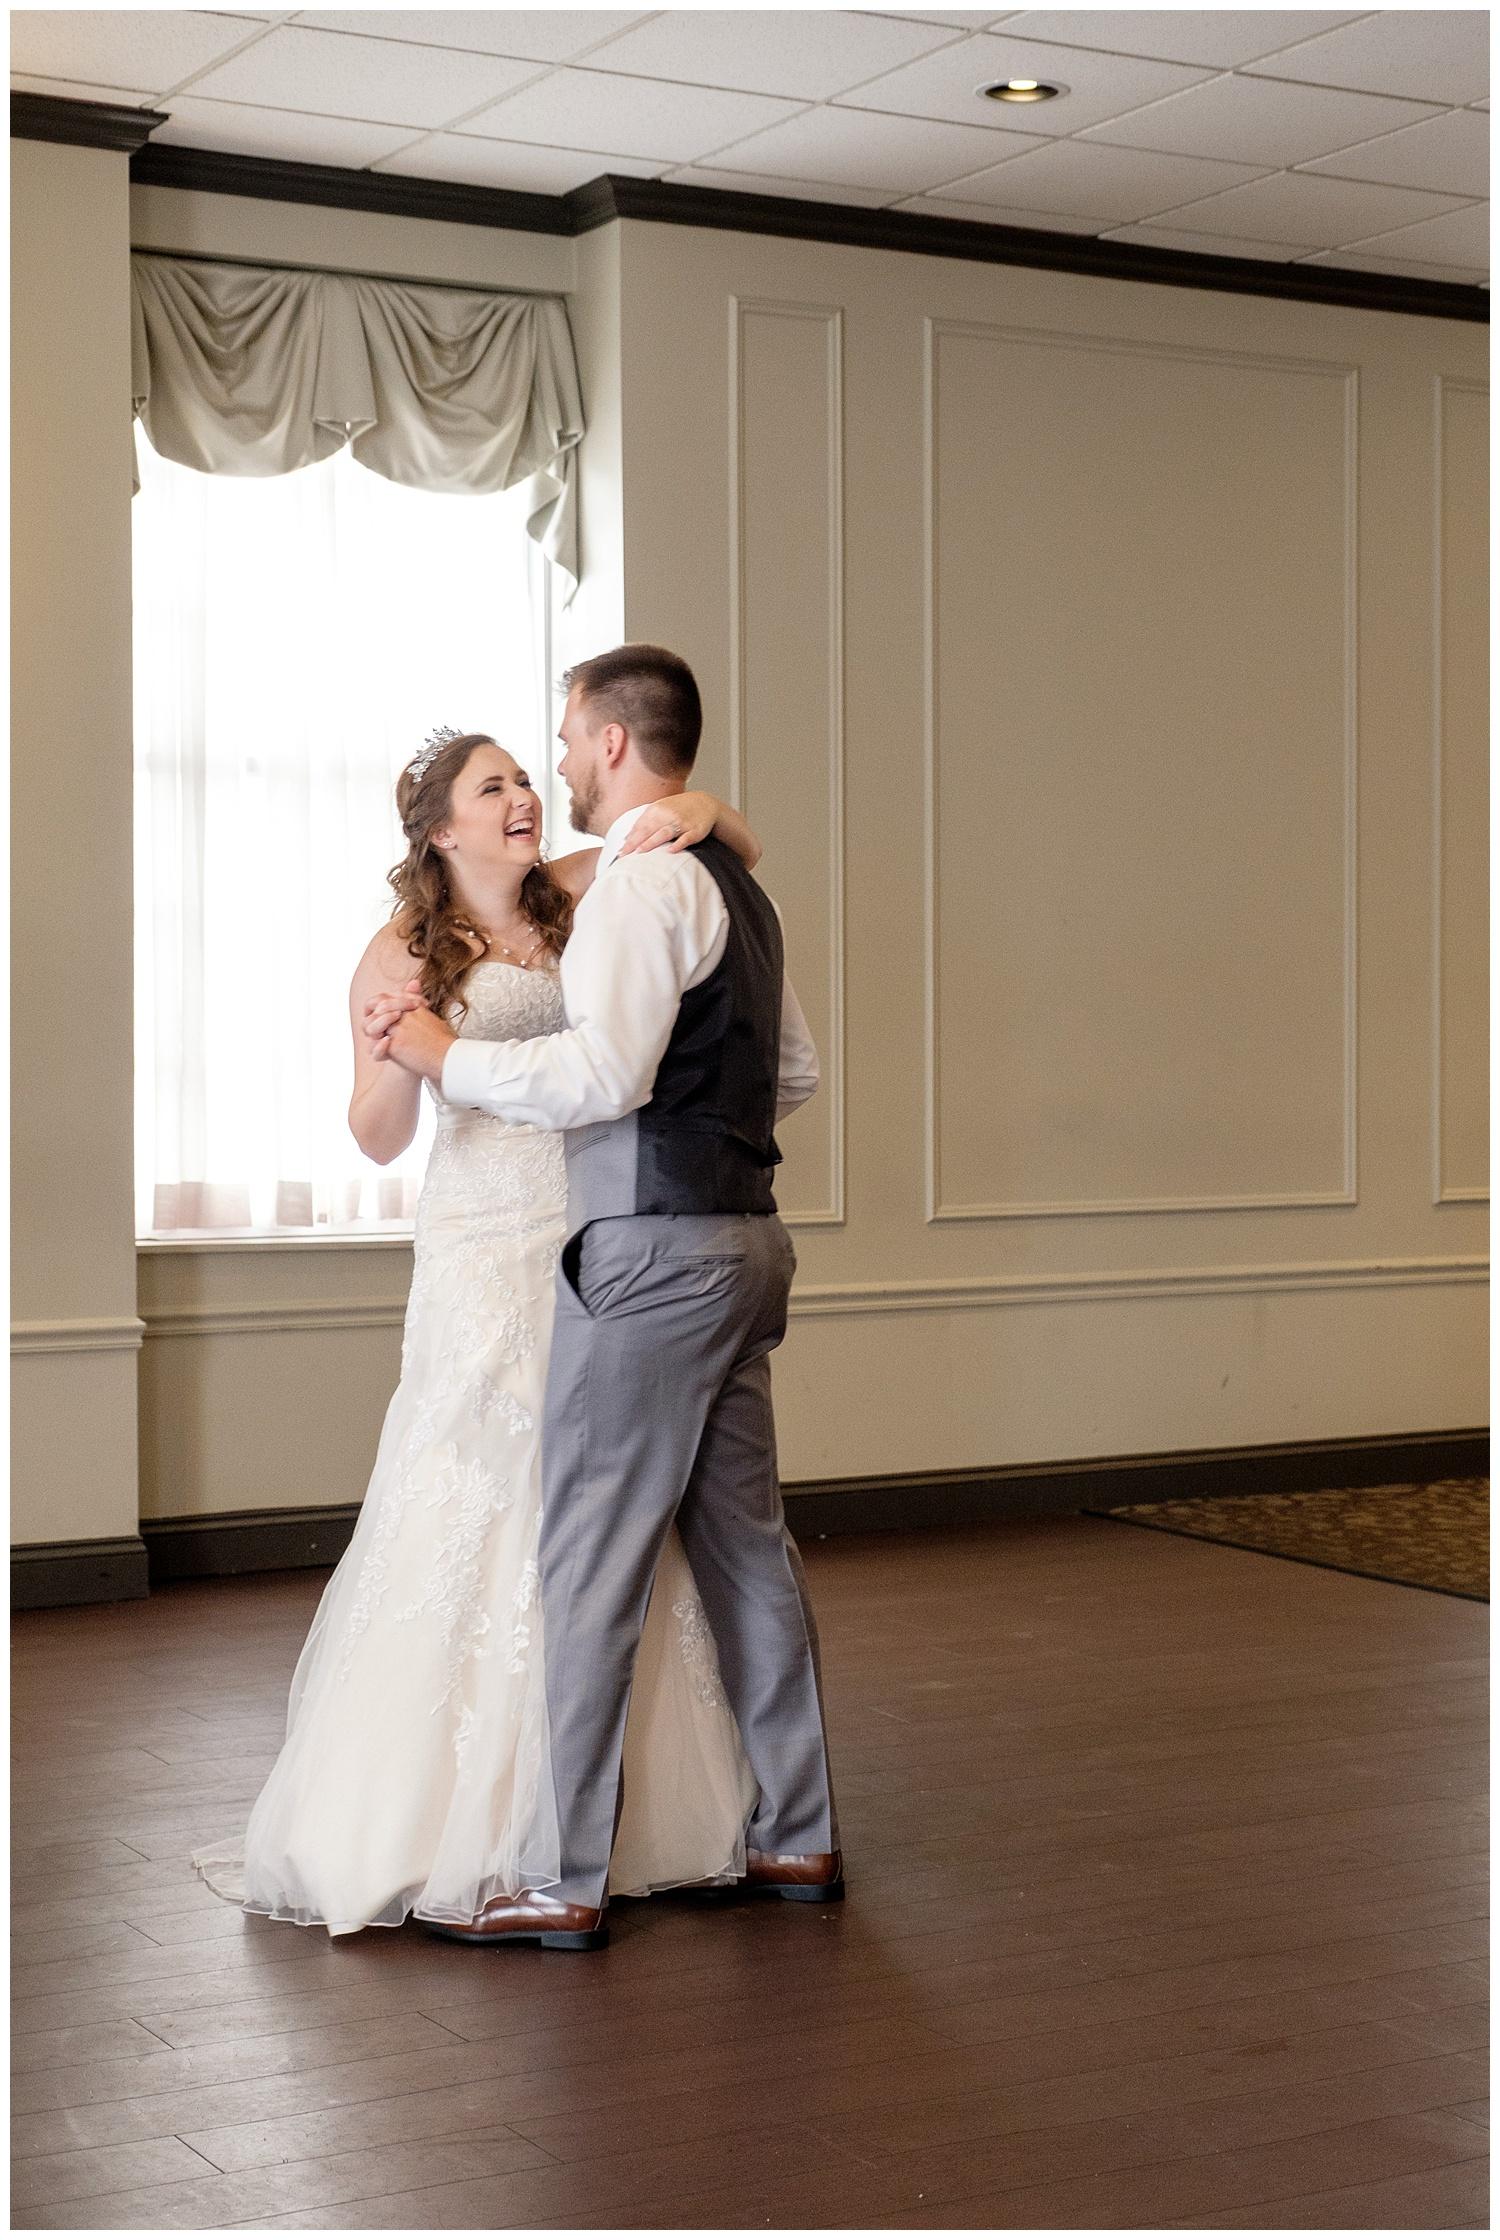 TheSmythCollective-Best-Cincinnati-Wedding-Photographer-Urban-Downtown-Covington-Wedding-28.jpg